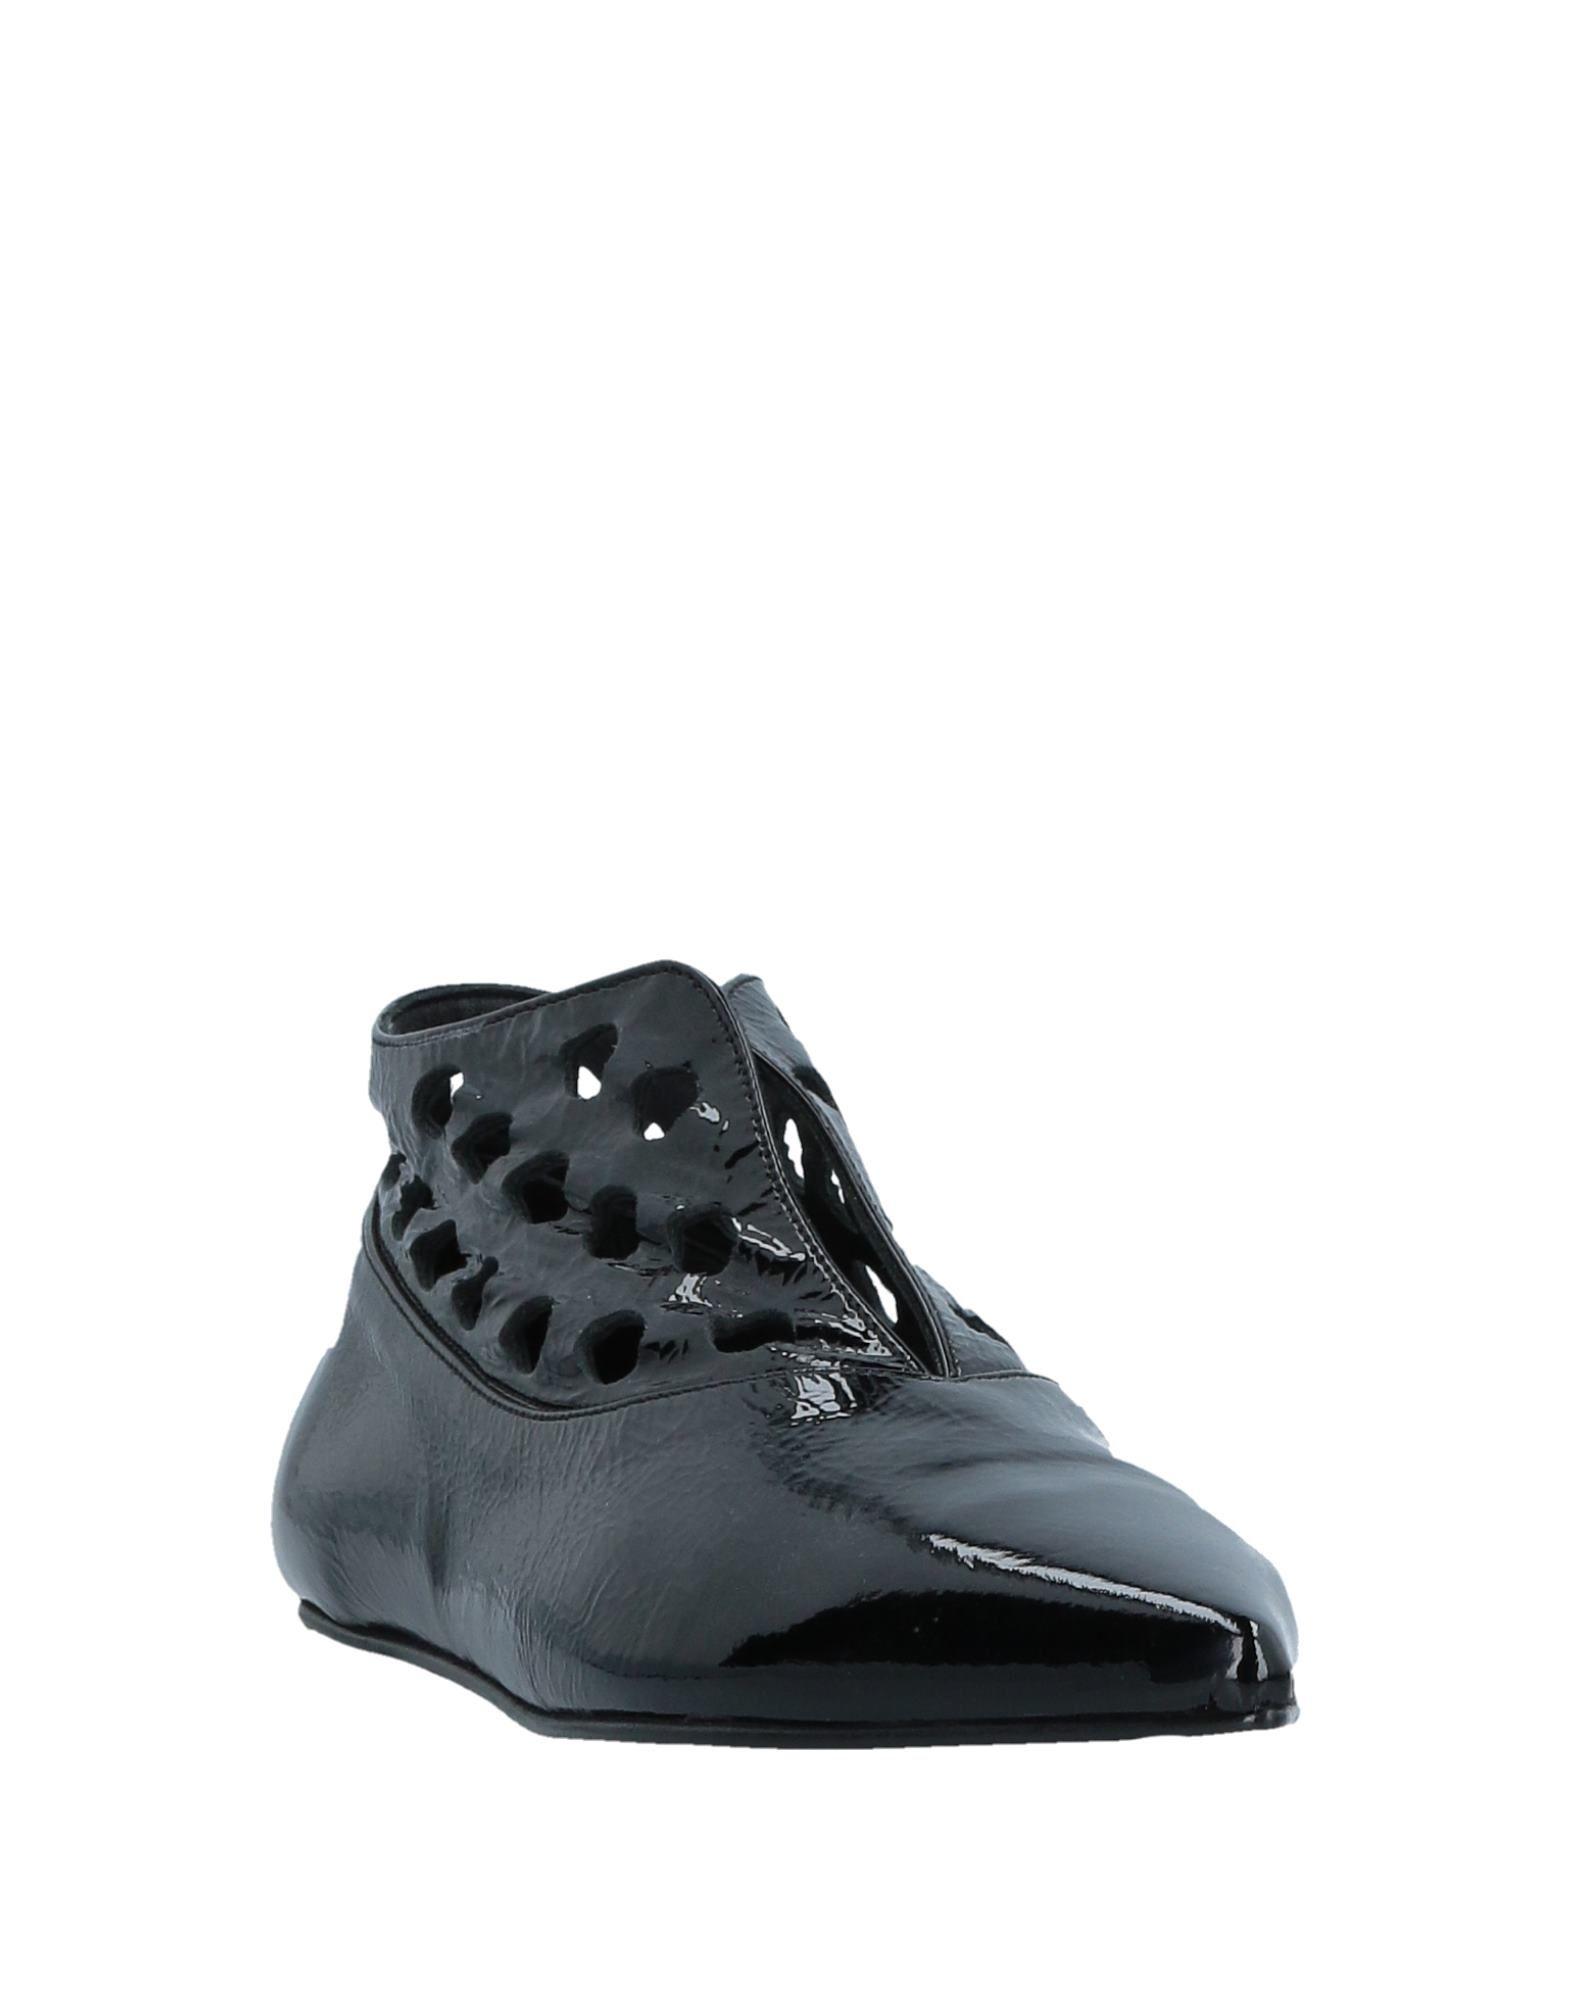 Stilvolle billige Schuhe Paloma 11516774JI Barceló Stiefelette Damen  11516774JI Paloma 7cfb2e